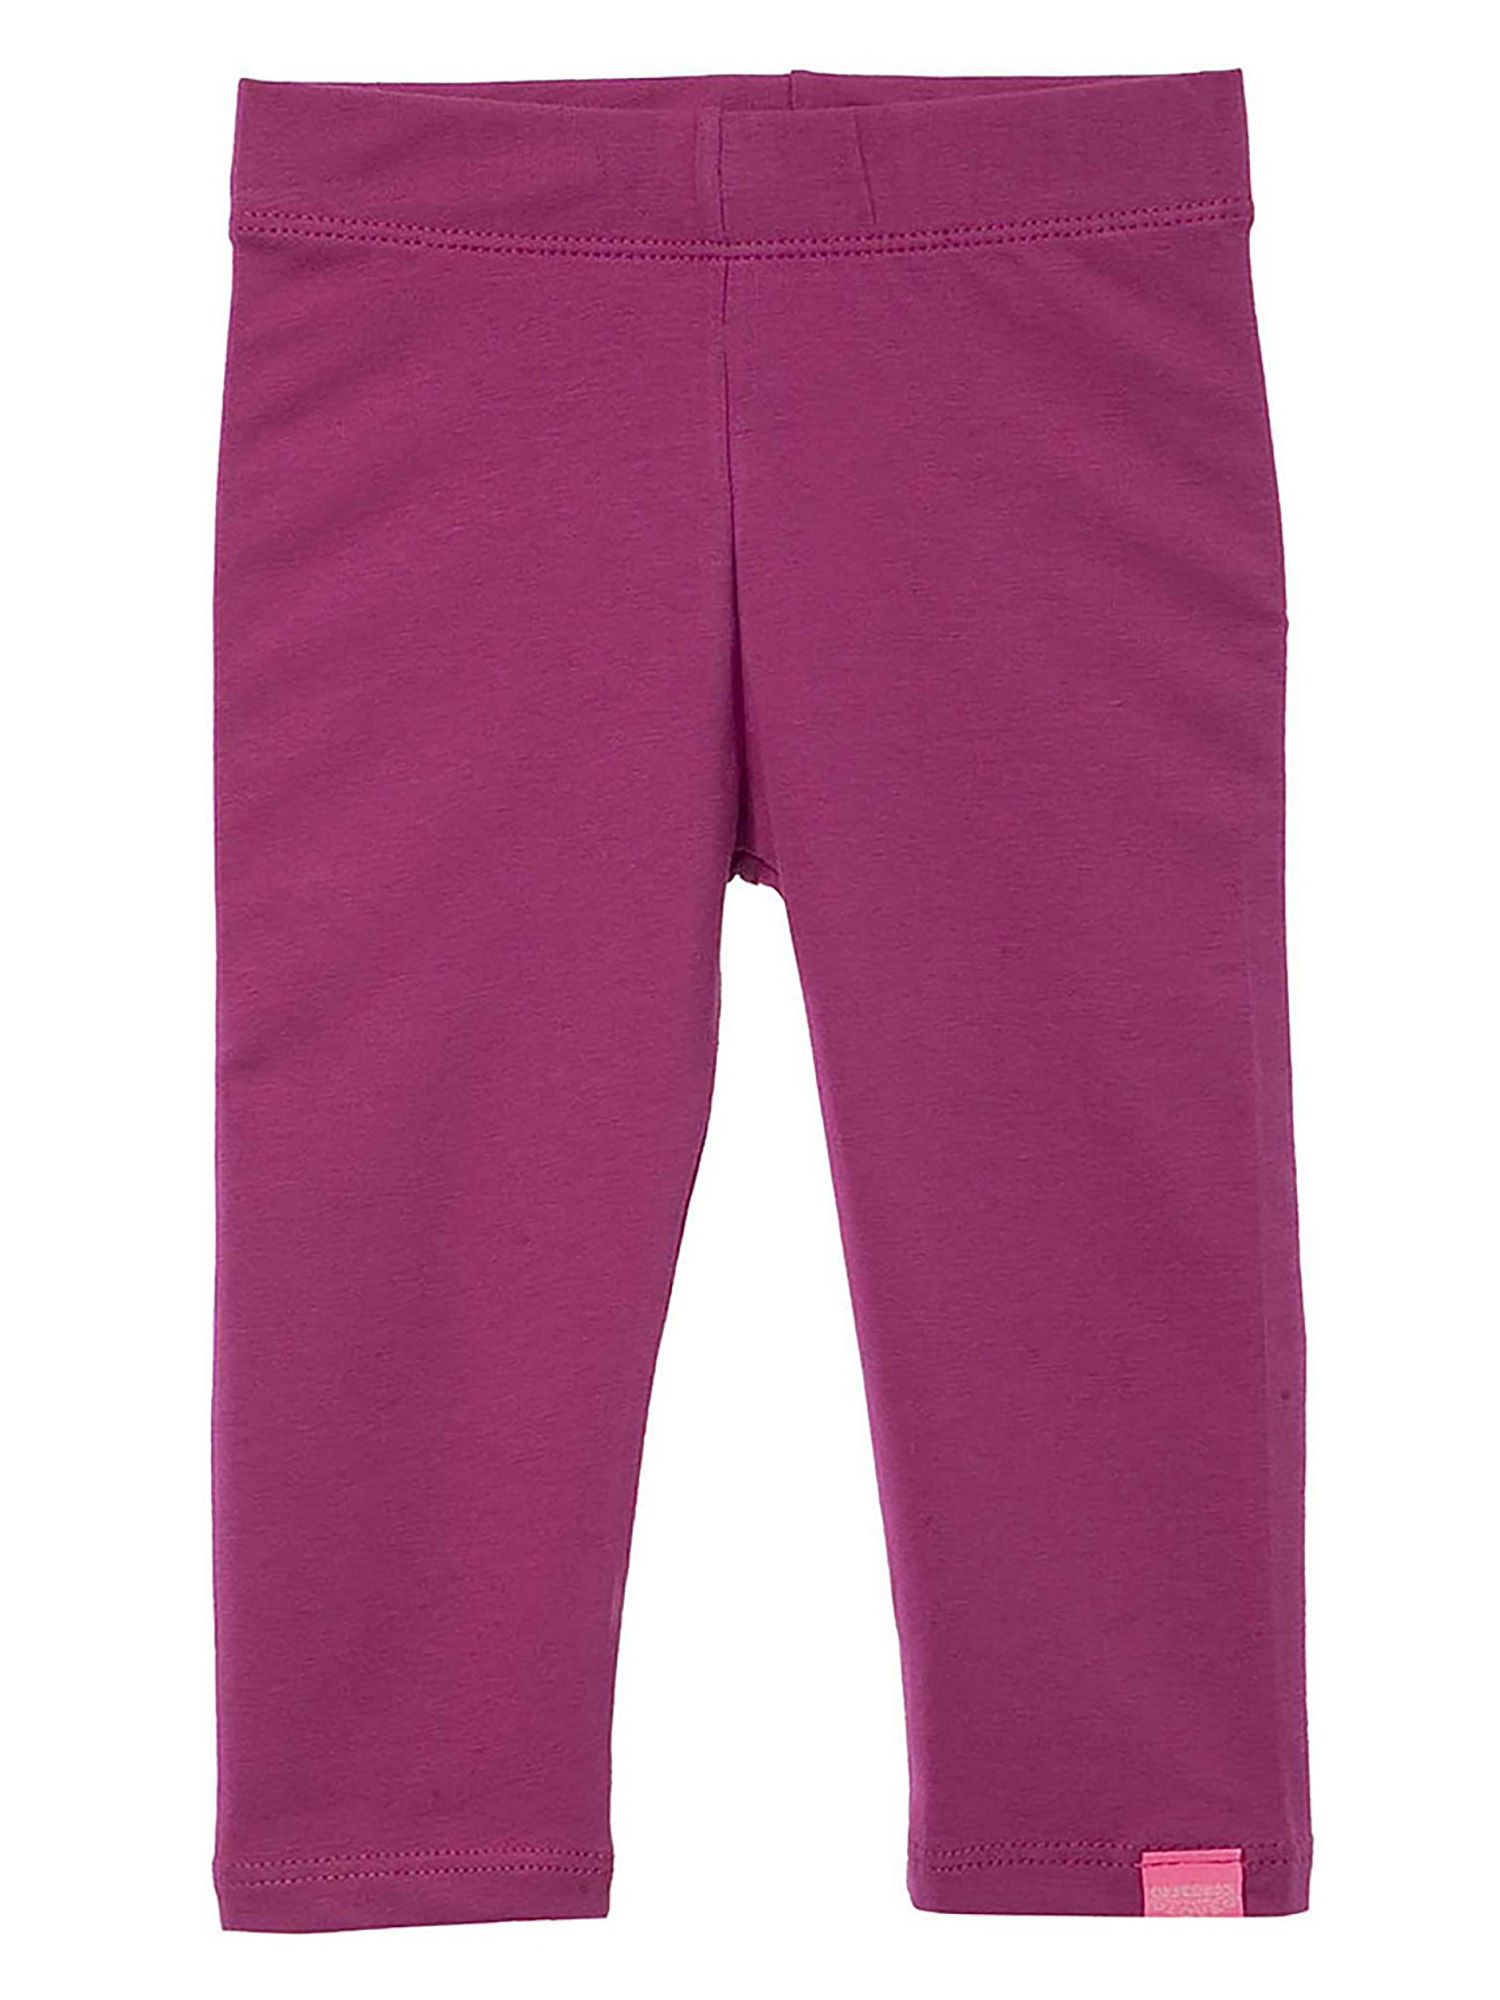 OFFCORSS Kids Little Girls Leggings For Toddlers   Pantalones Para Niñas